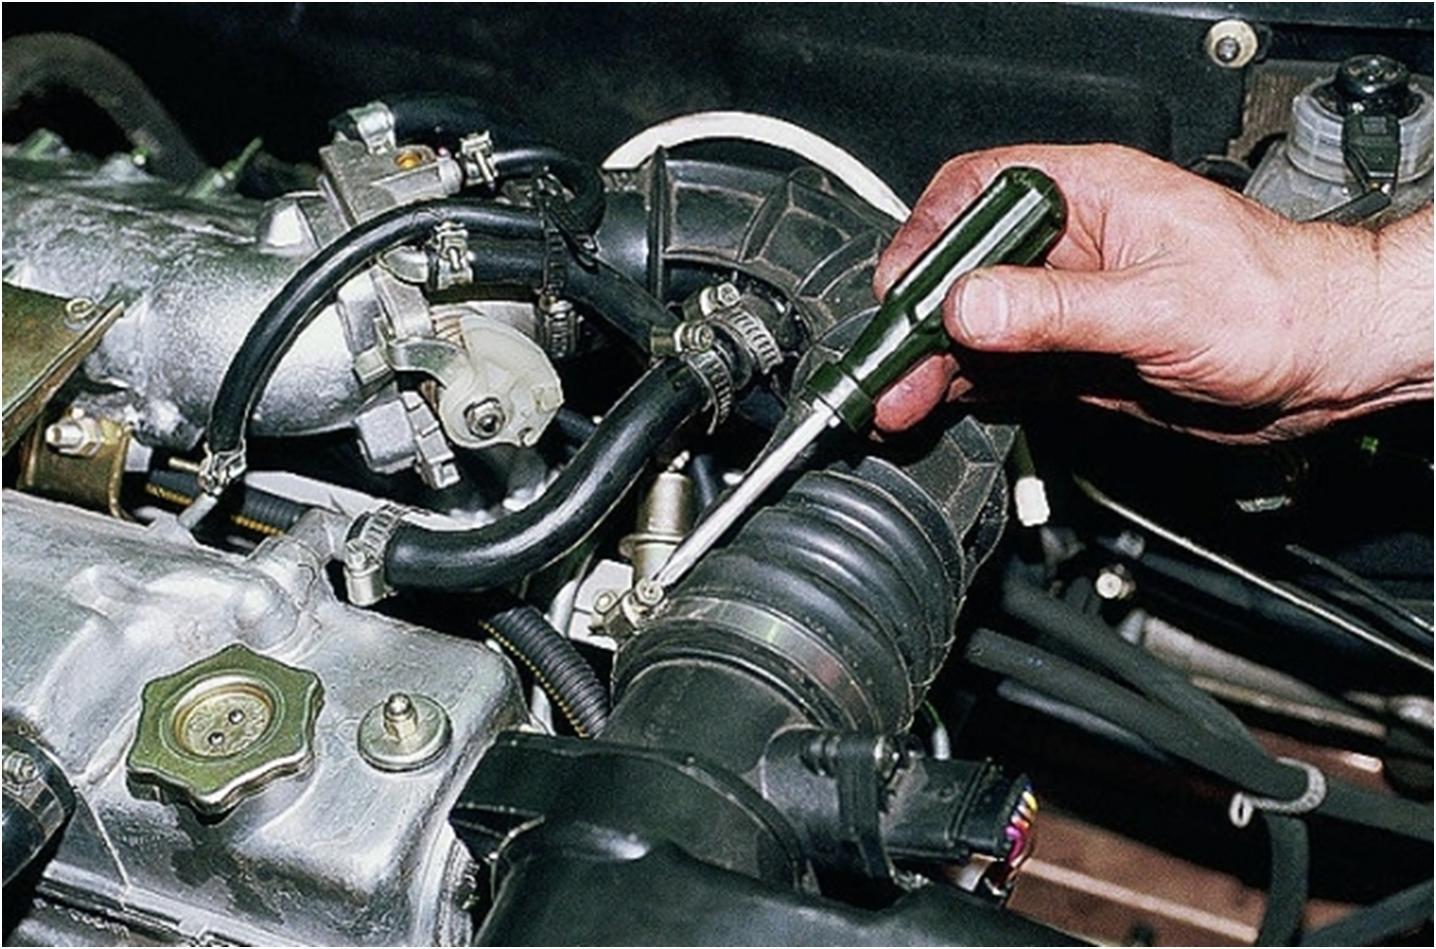 Почему машина глохнет на ходу на прогретом двигателе